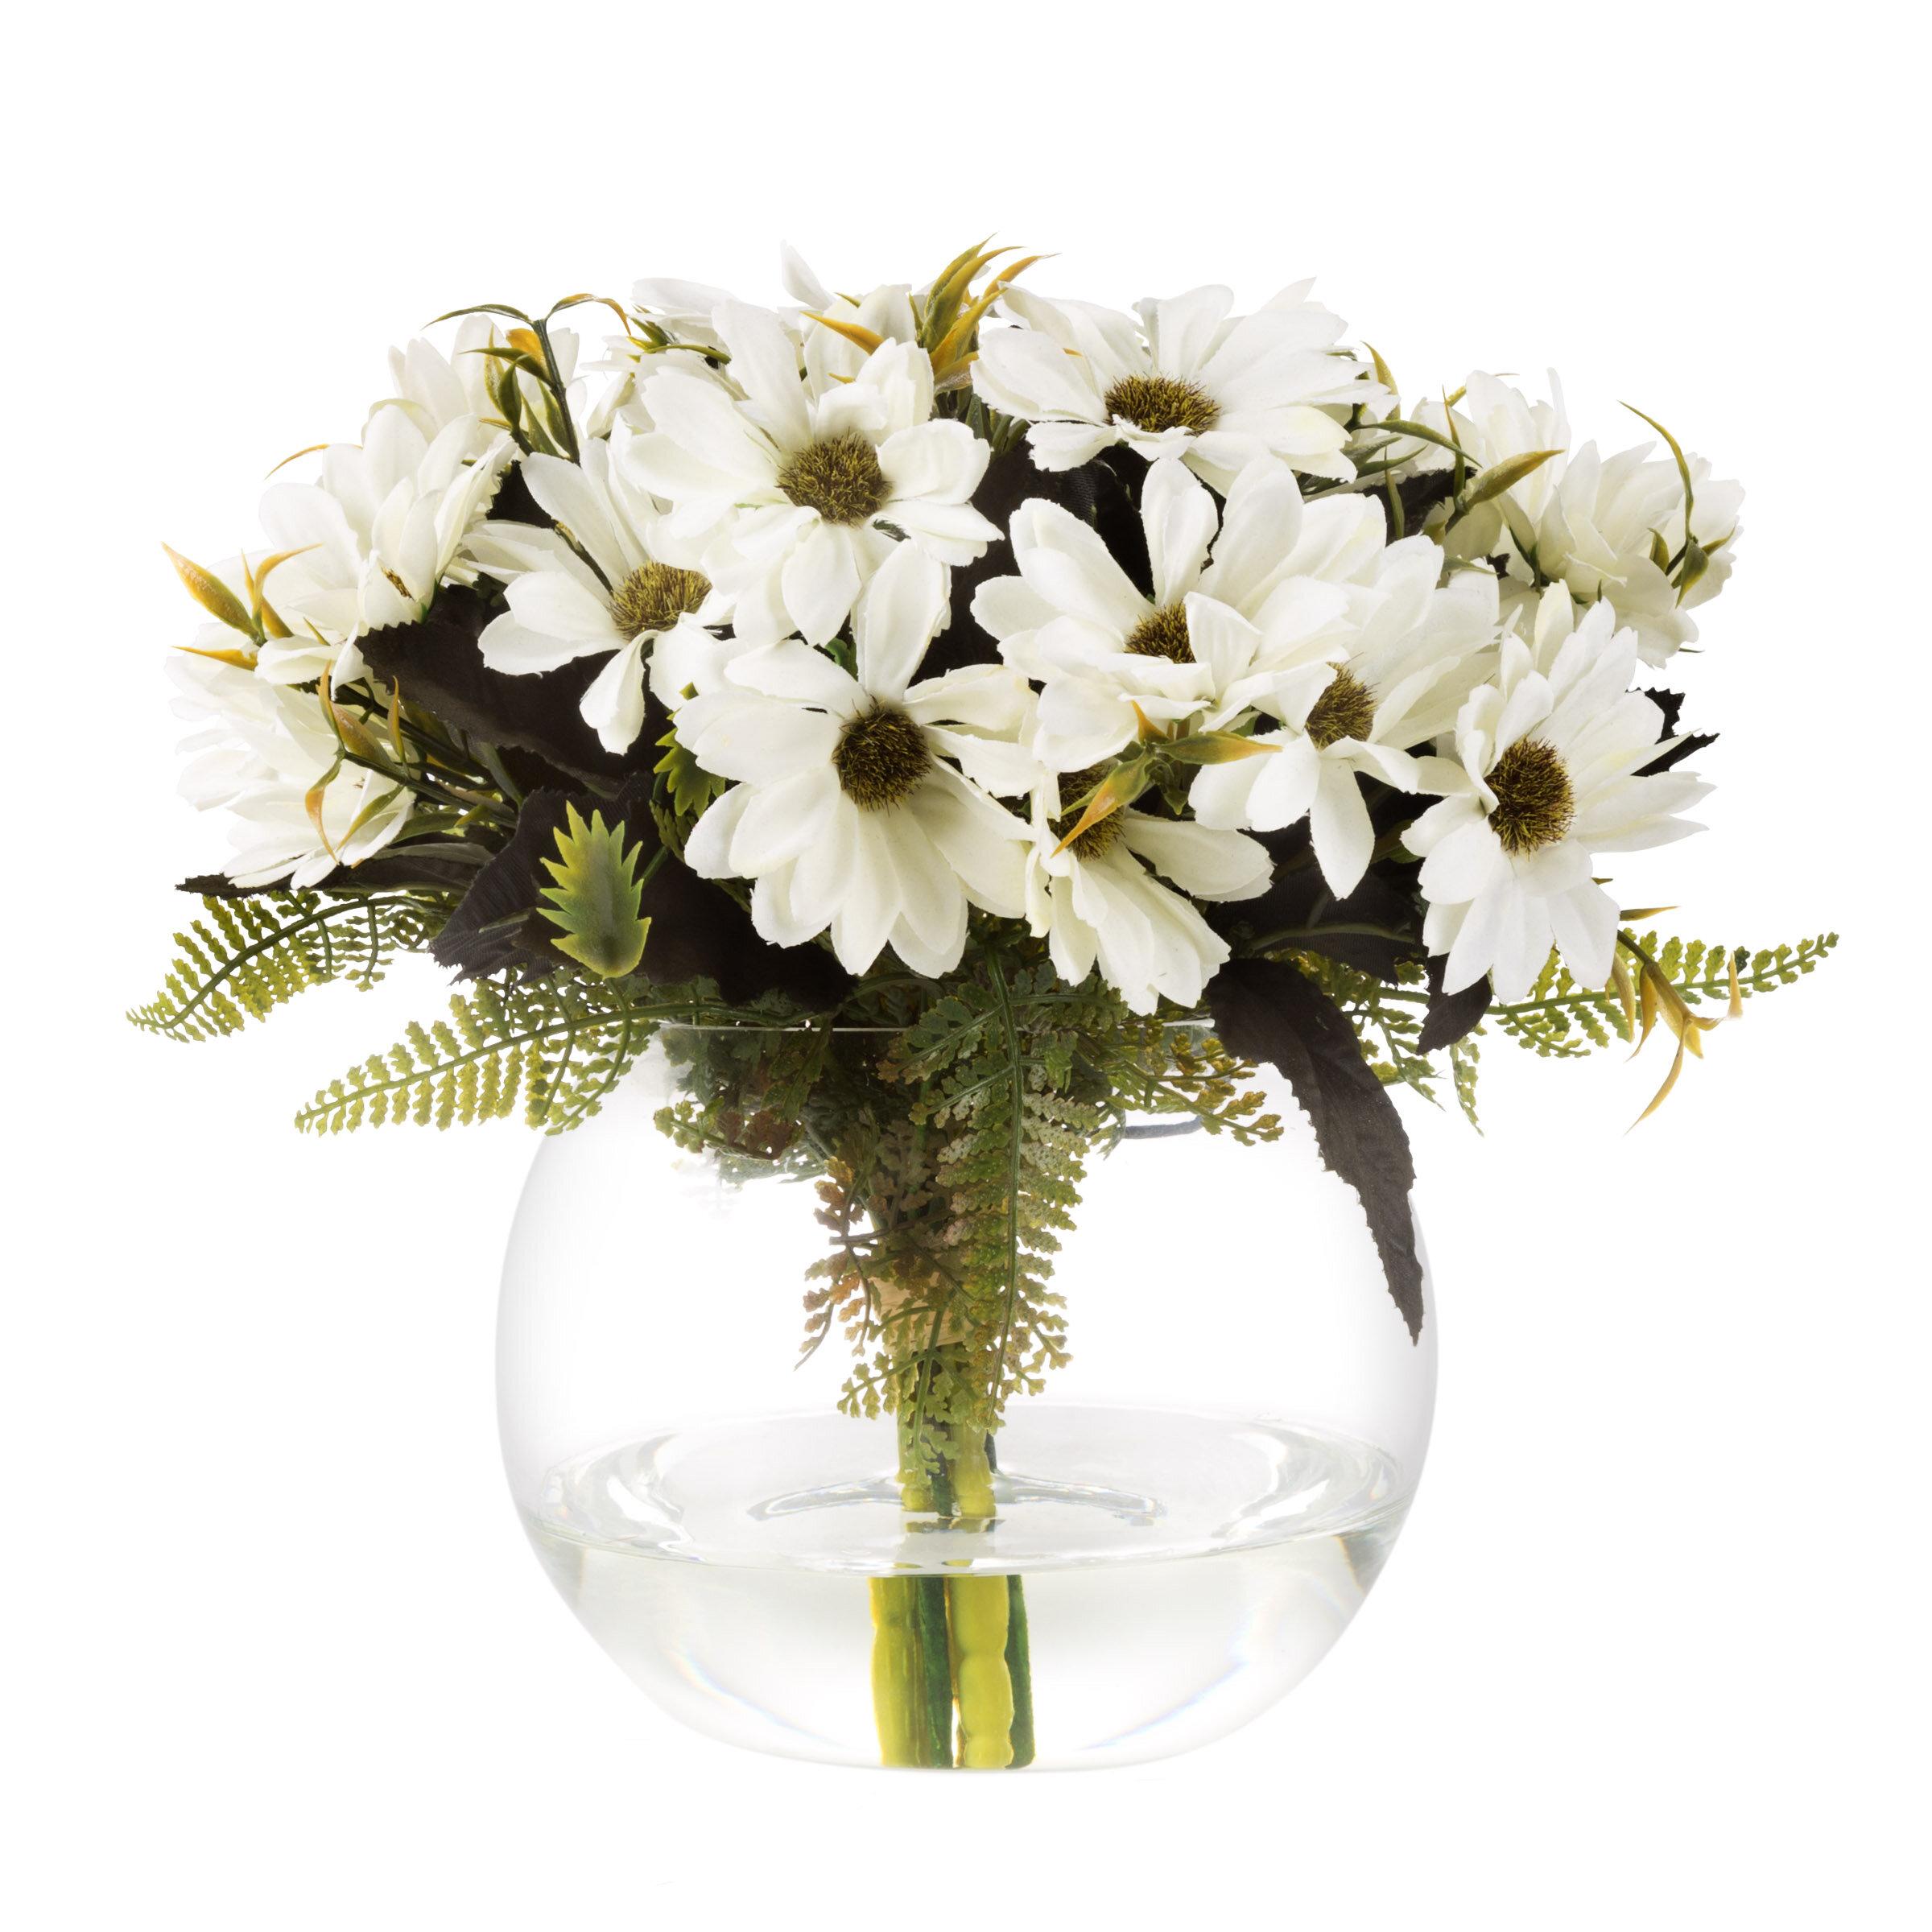 Charlton Home Daisy Floral Arrangement In Glass Vase Reviews Wayfair